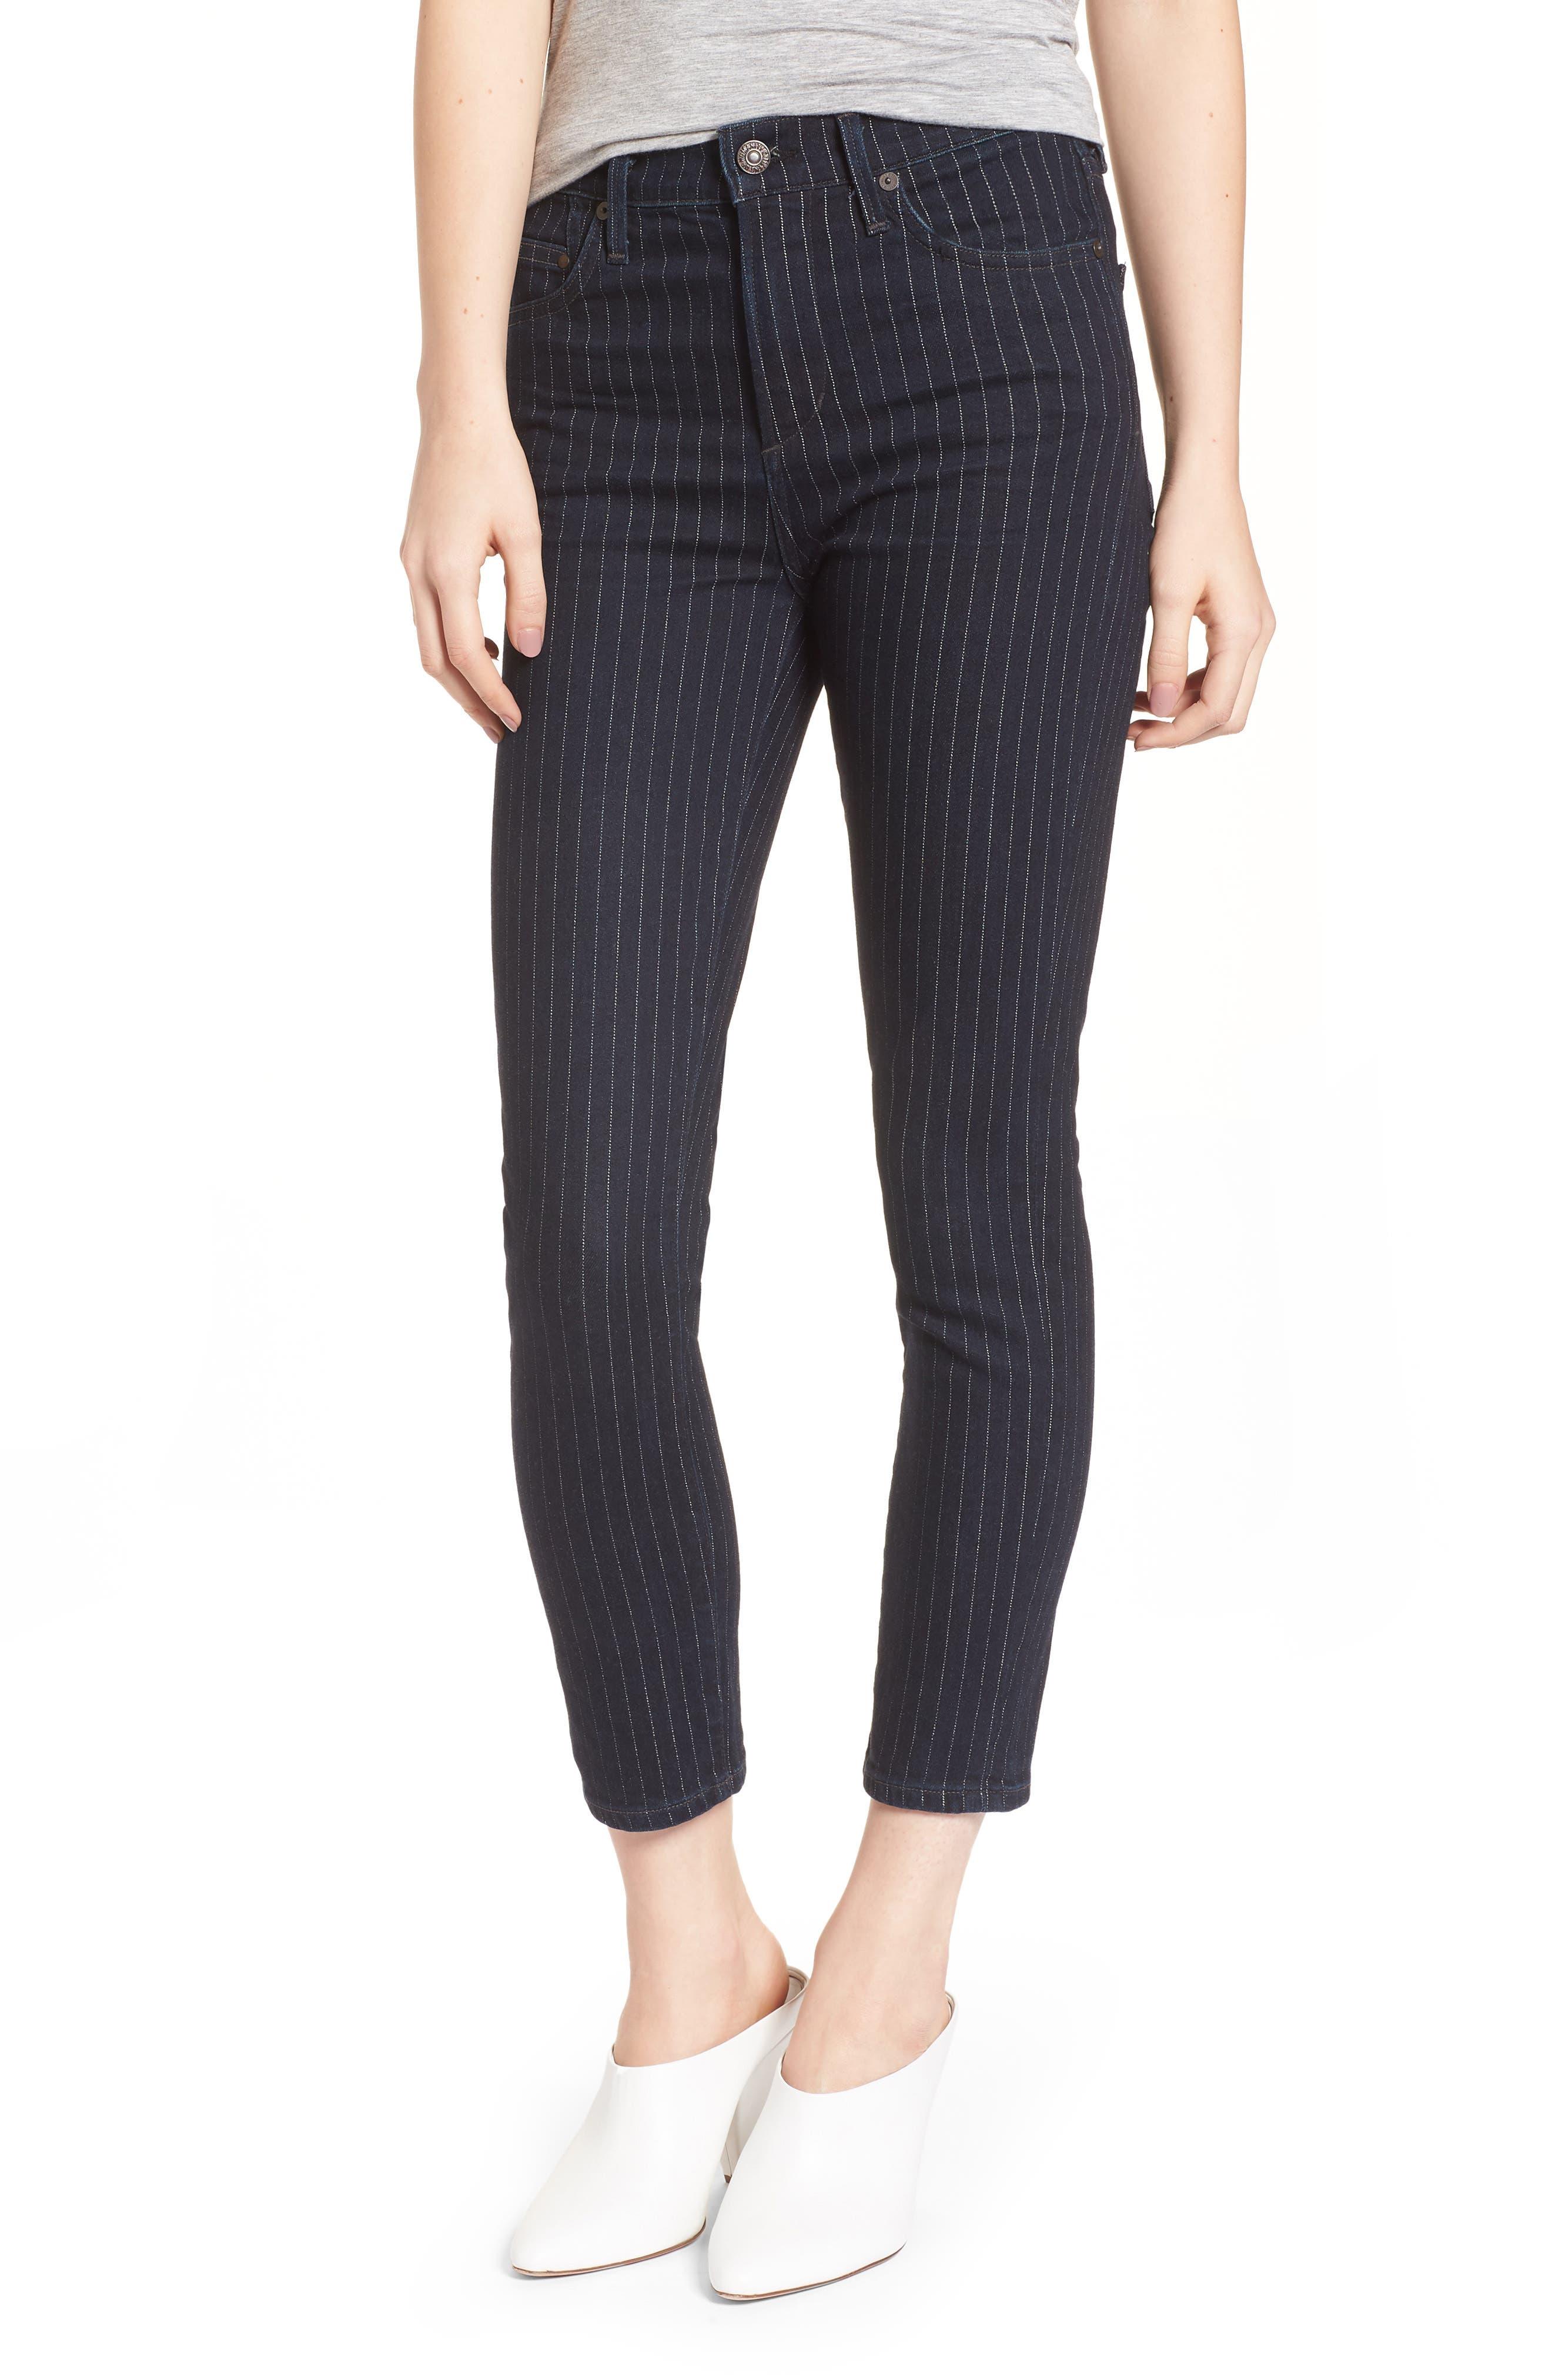 Rocket High Waist Crop Skinny Jeans,                             Main thumbnail 1, color,                             Pinstripe